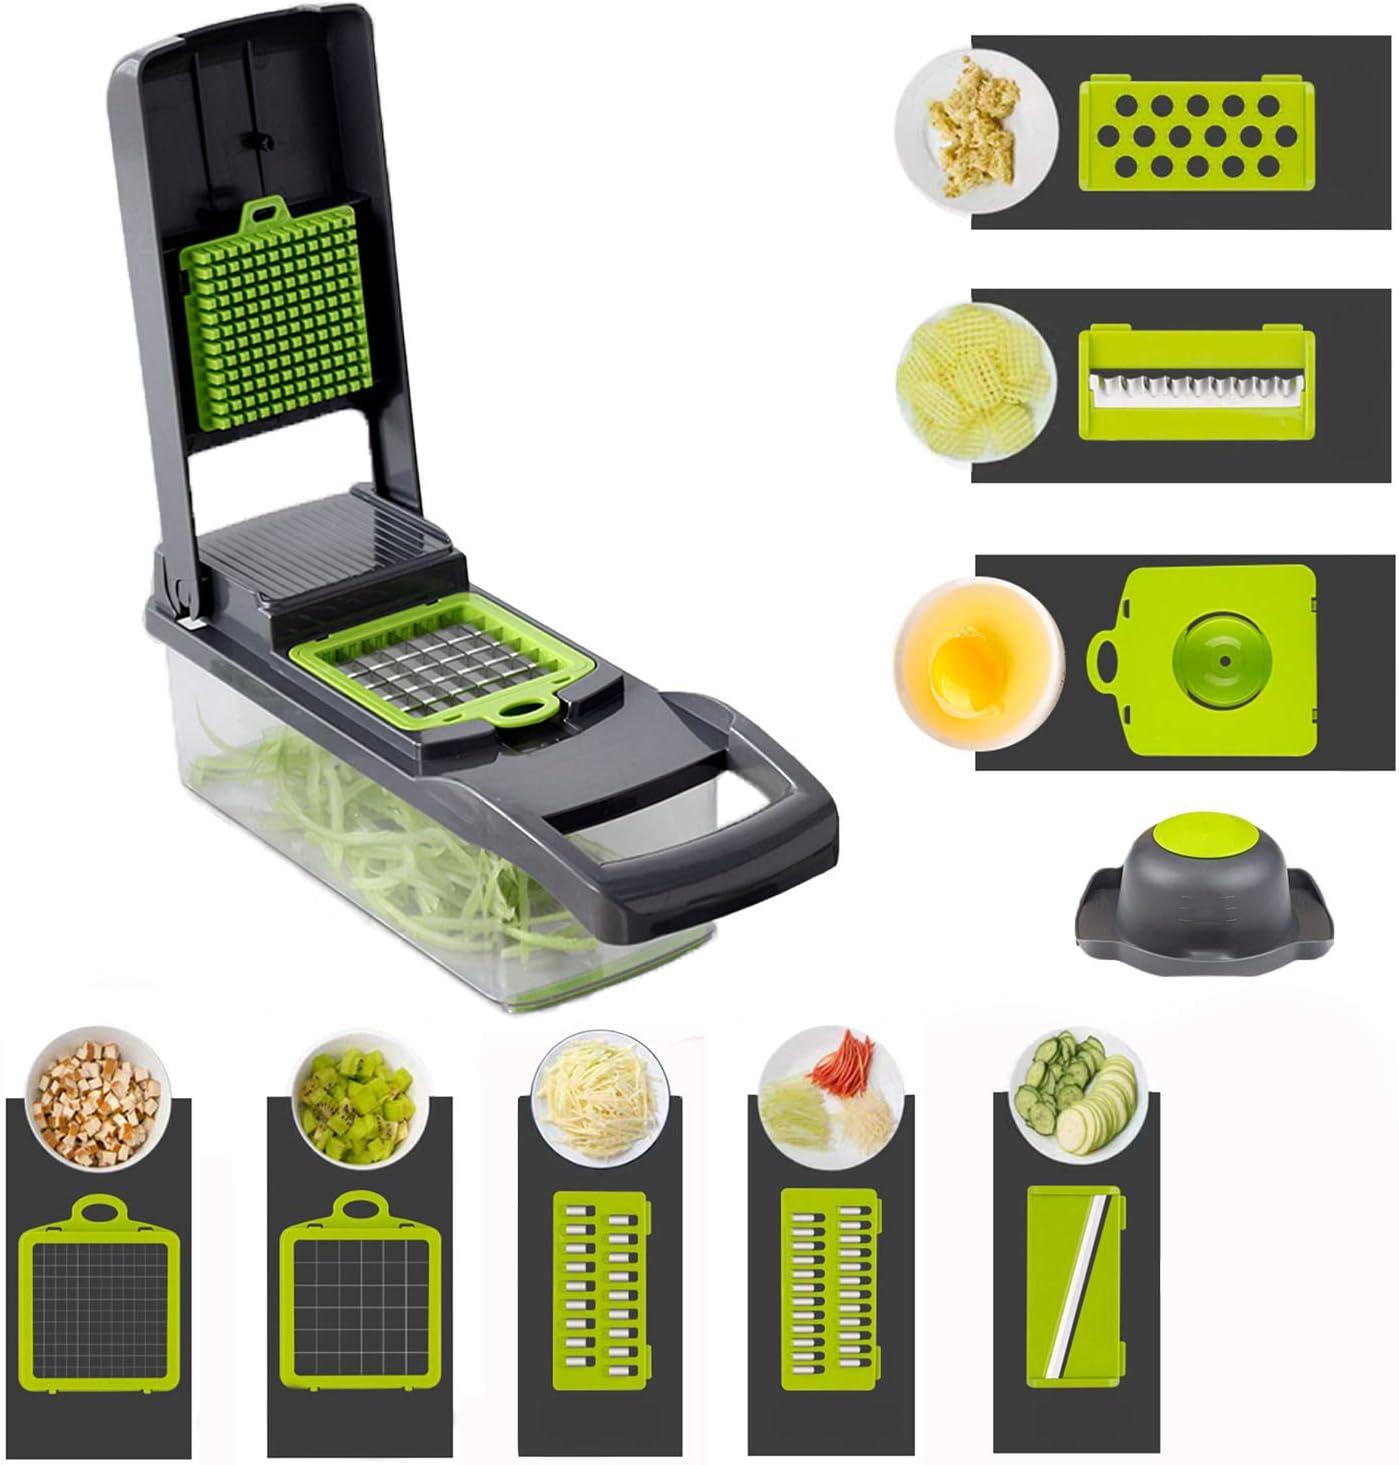 Onion Vegetable Chopper Slicer Halcyon - Smart Mandoline Slicer Cutter - Food Chopper for Veggie Potato Tomato